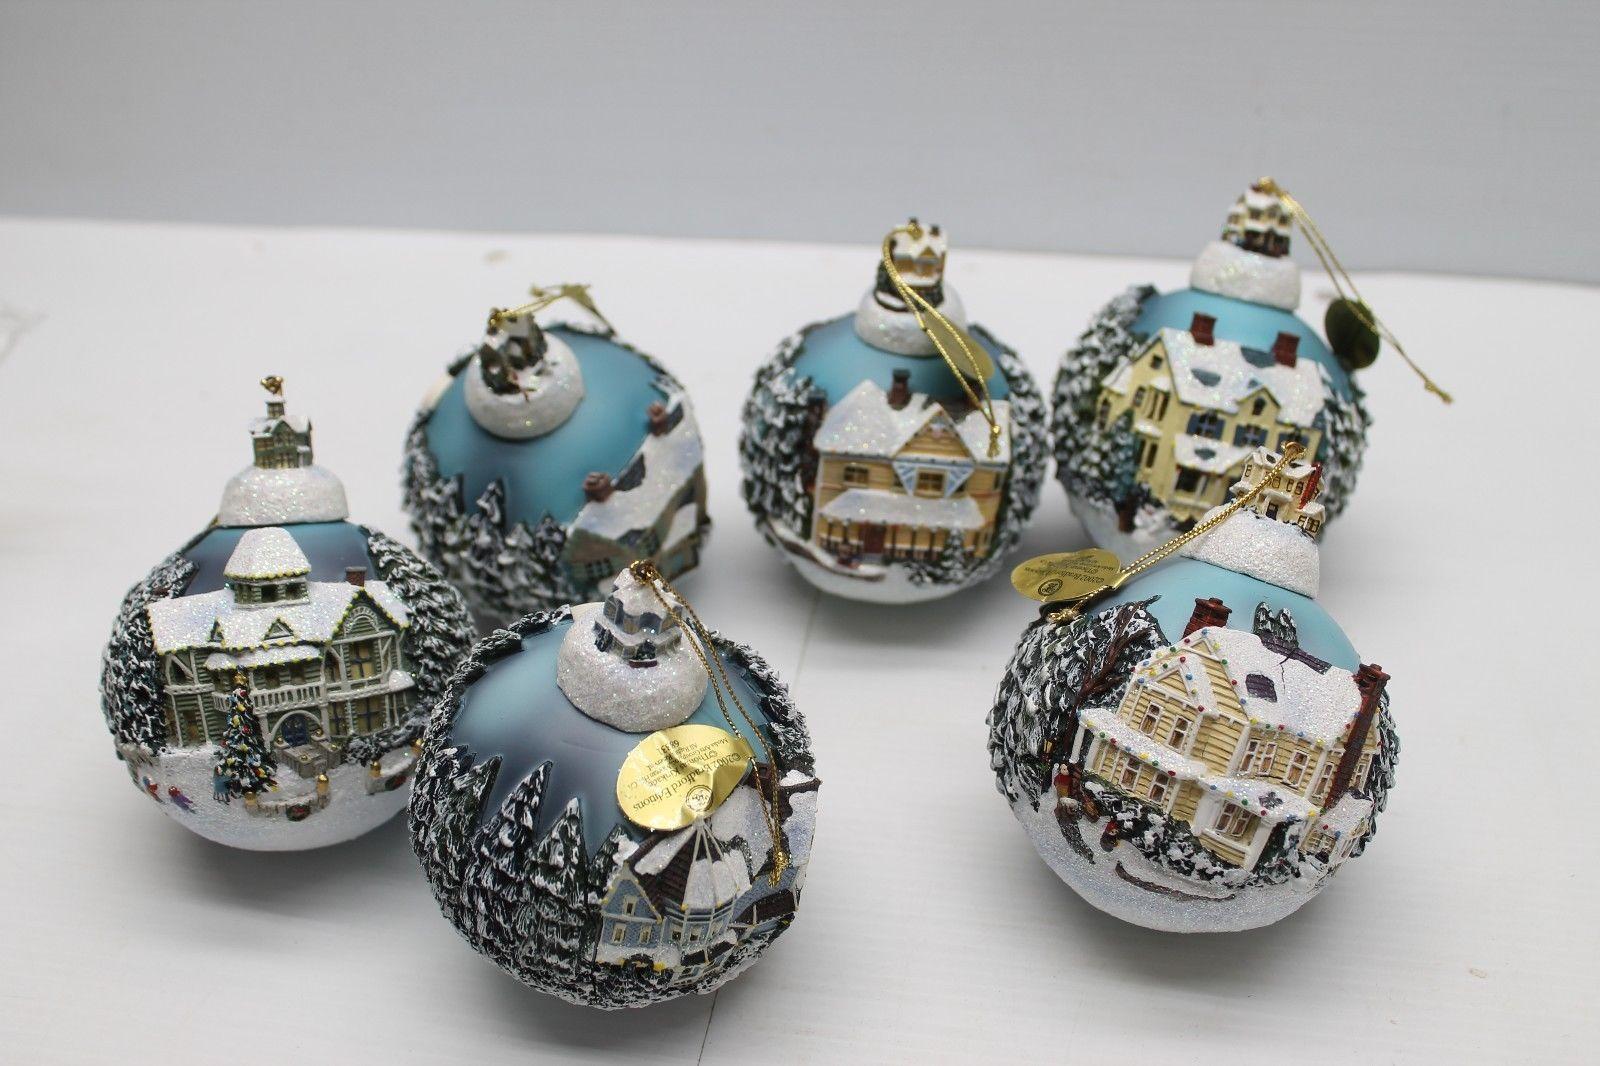 Kinkade christmas ornaments - Thomas Kinkade Christmas Classics Bradford Exchange Ornaments Lot 9